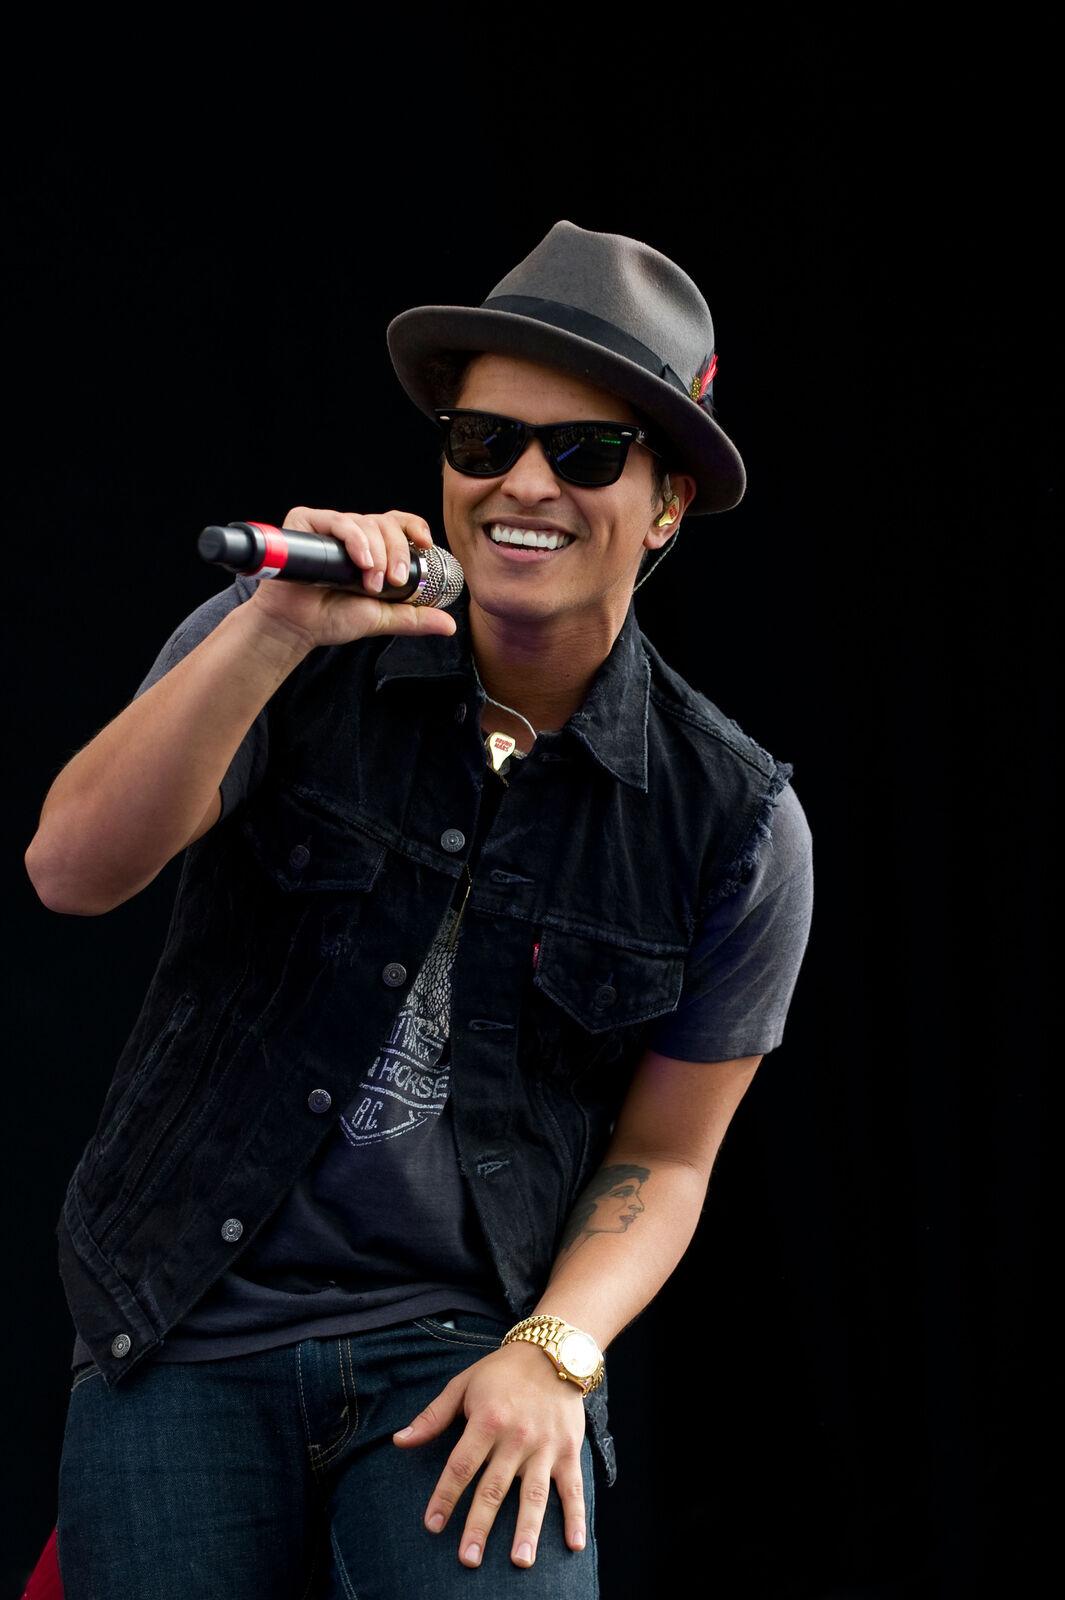 Bruno Mars Tour 2020.Bruno Mars Las Vegas Tickets 4 20 2020 At Park Theater At